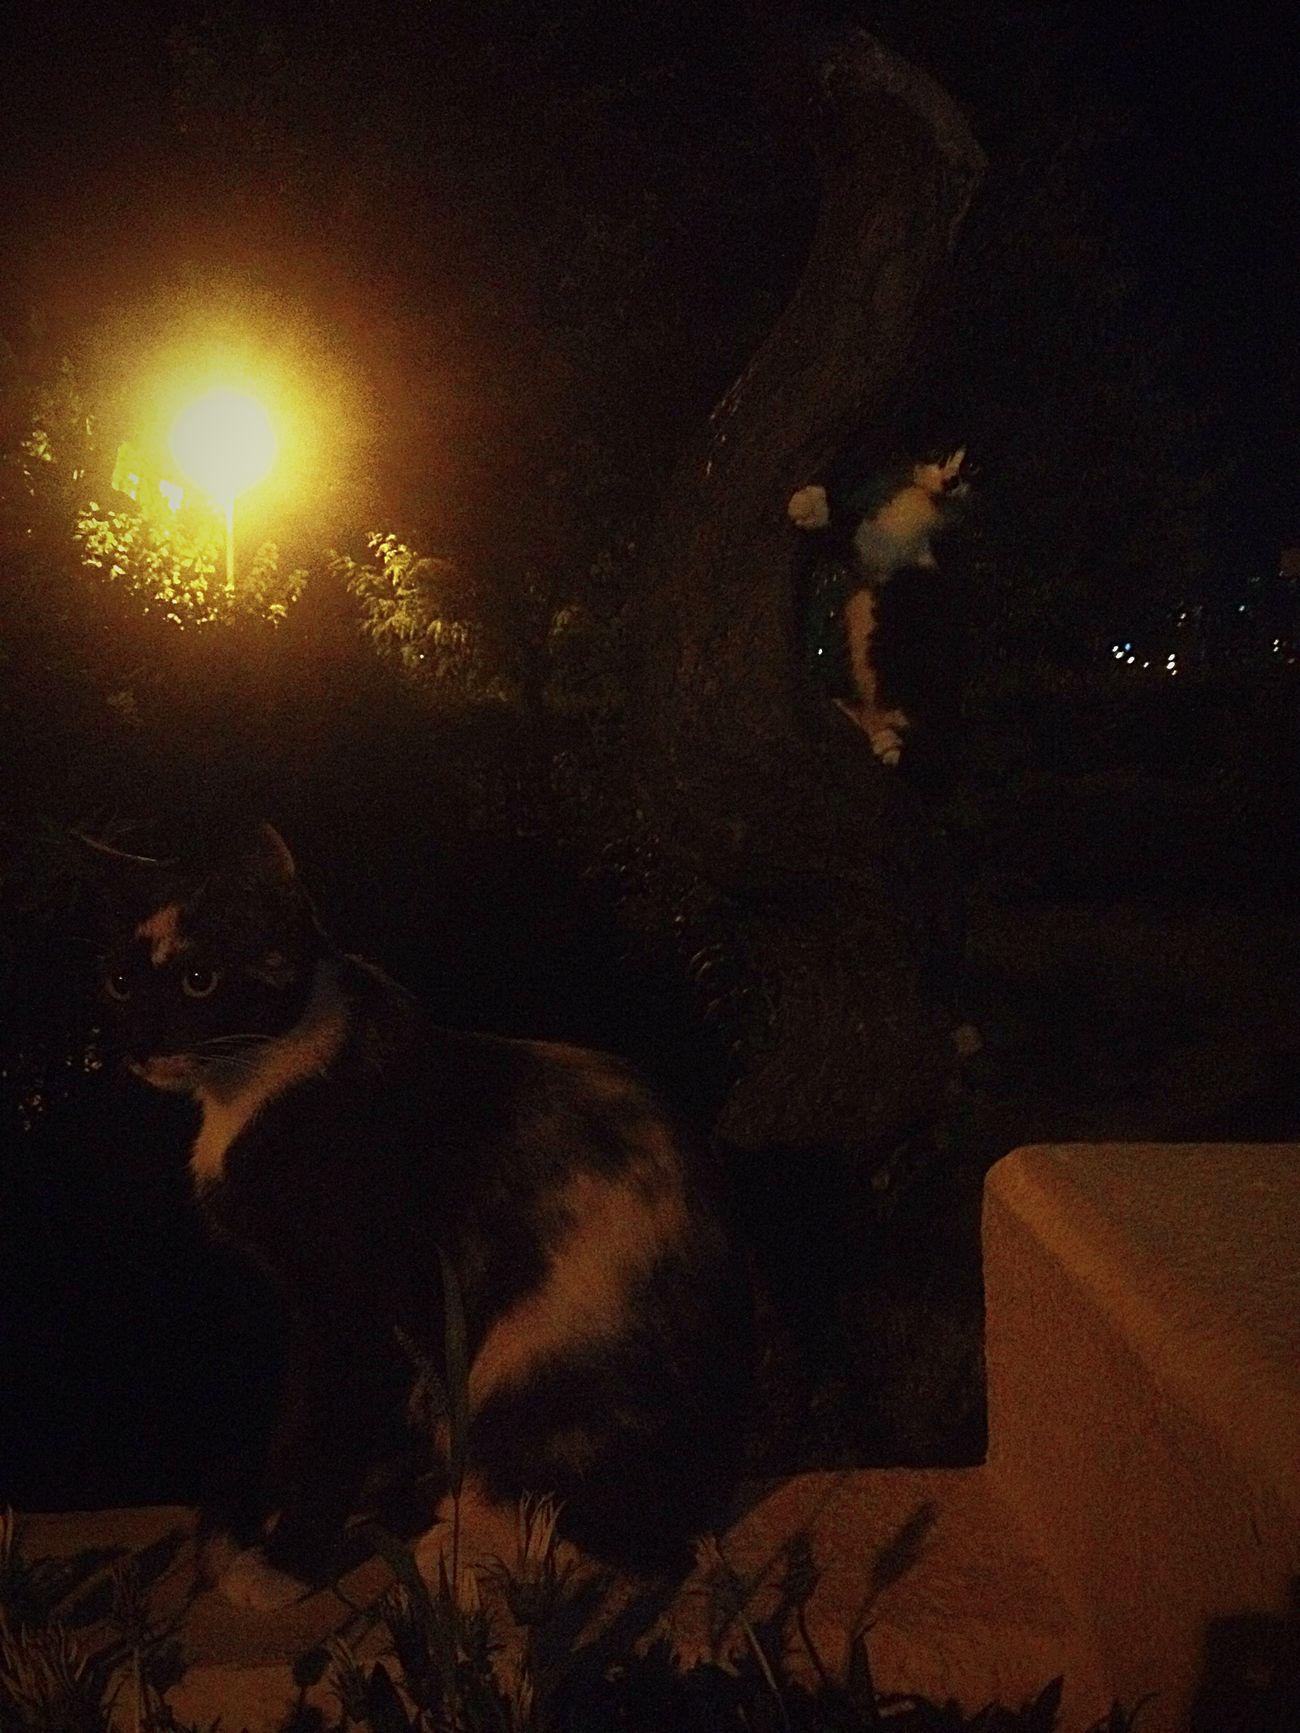 Cat Cats Cat♡ Catsofinstagram Cat Lovers Cute Cats Istanbulunkedileri Mom Motherofcats Tree